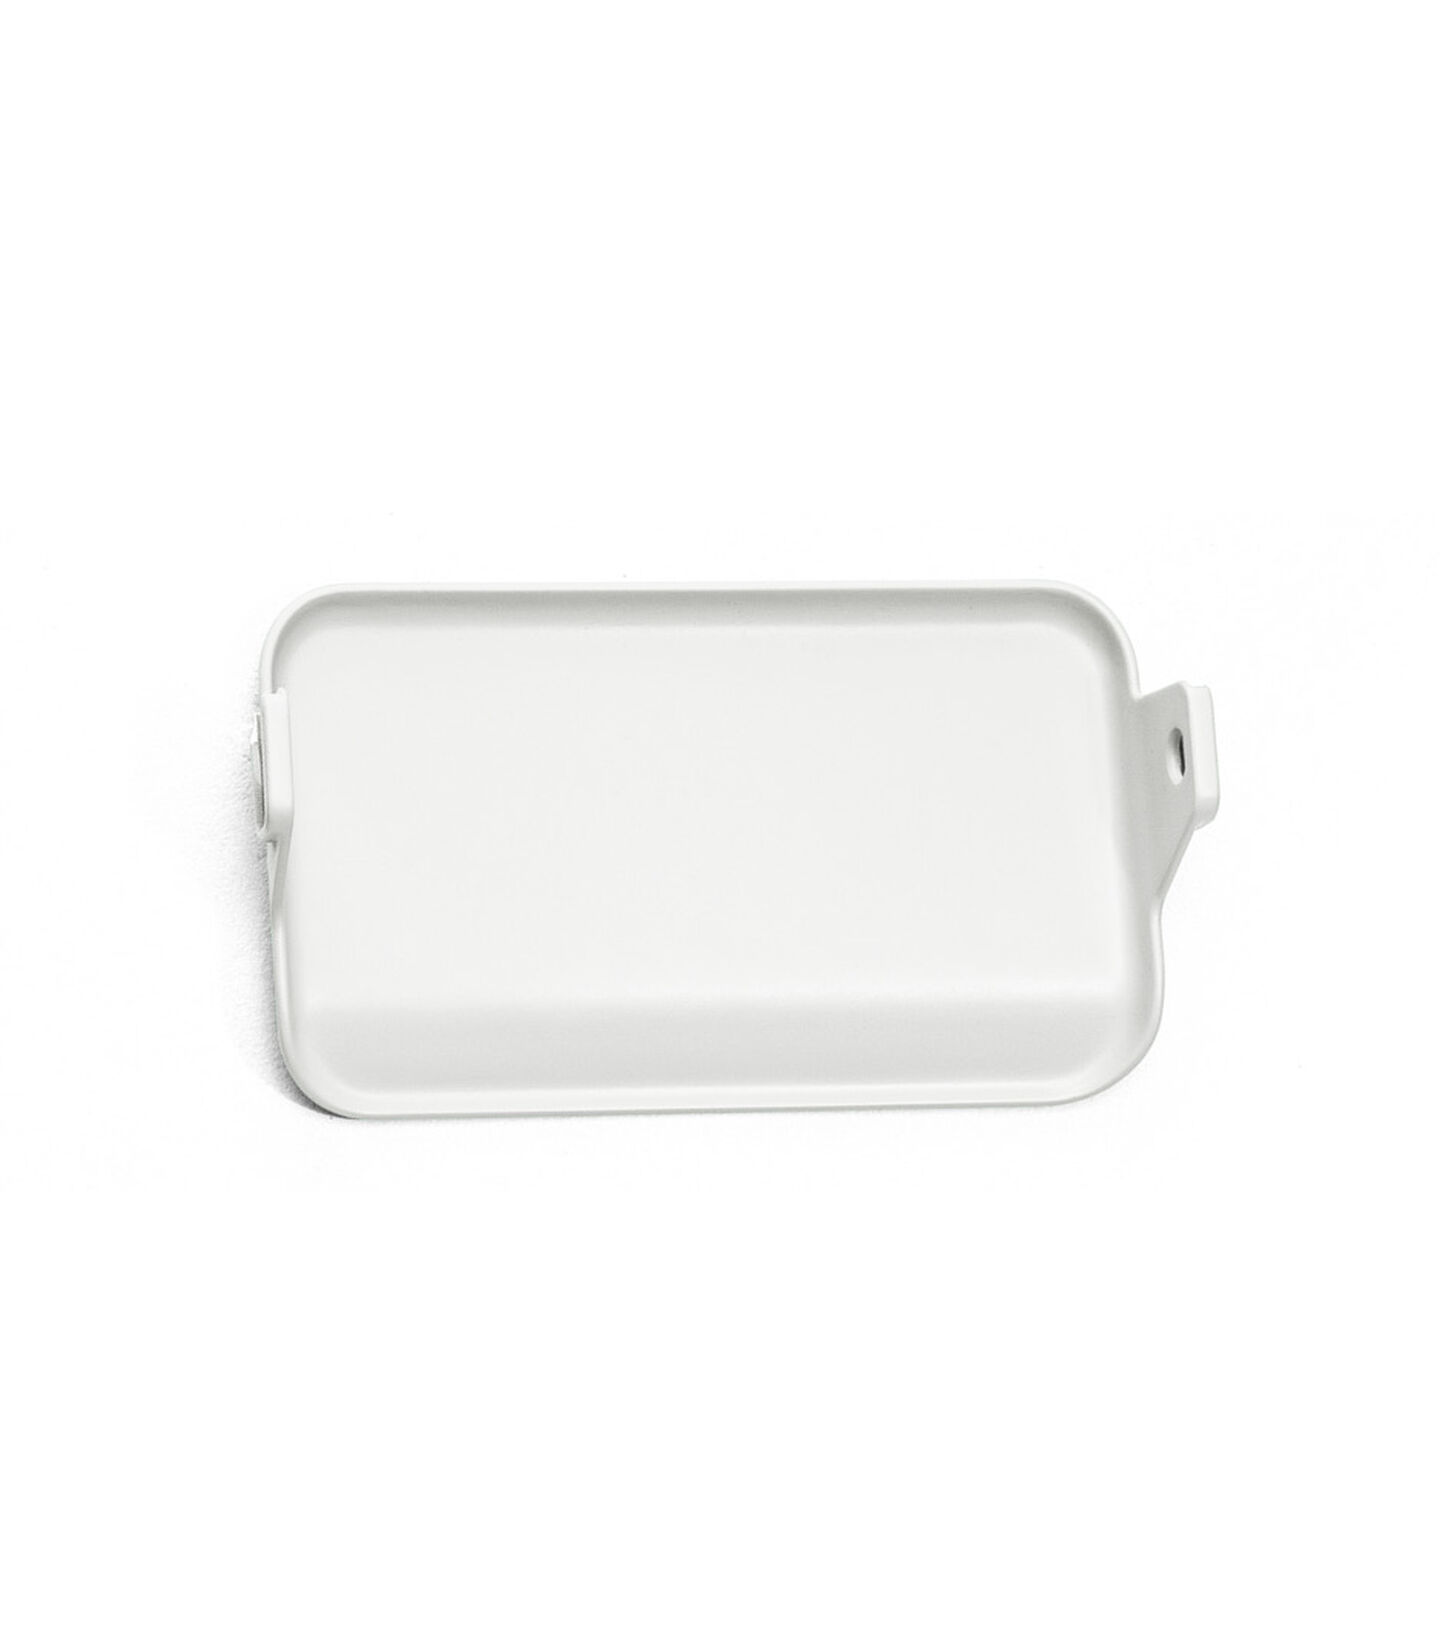 Stokke® Clikk™ Footrest White, White, mainview view 1